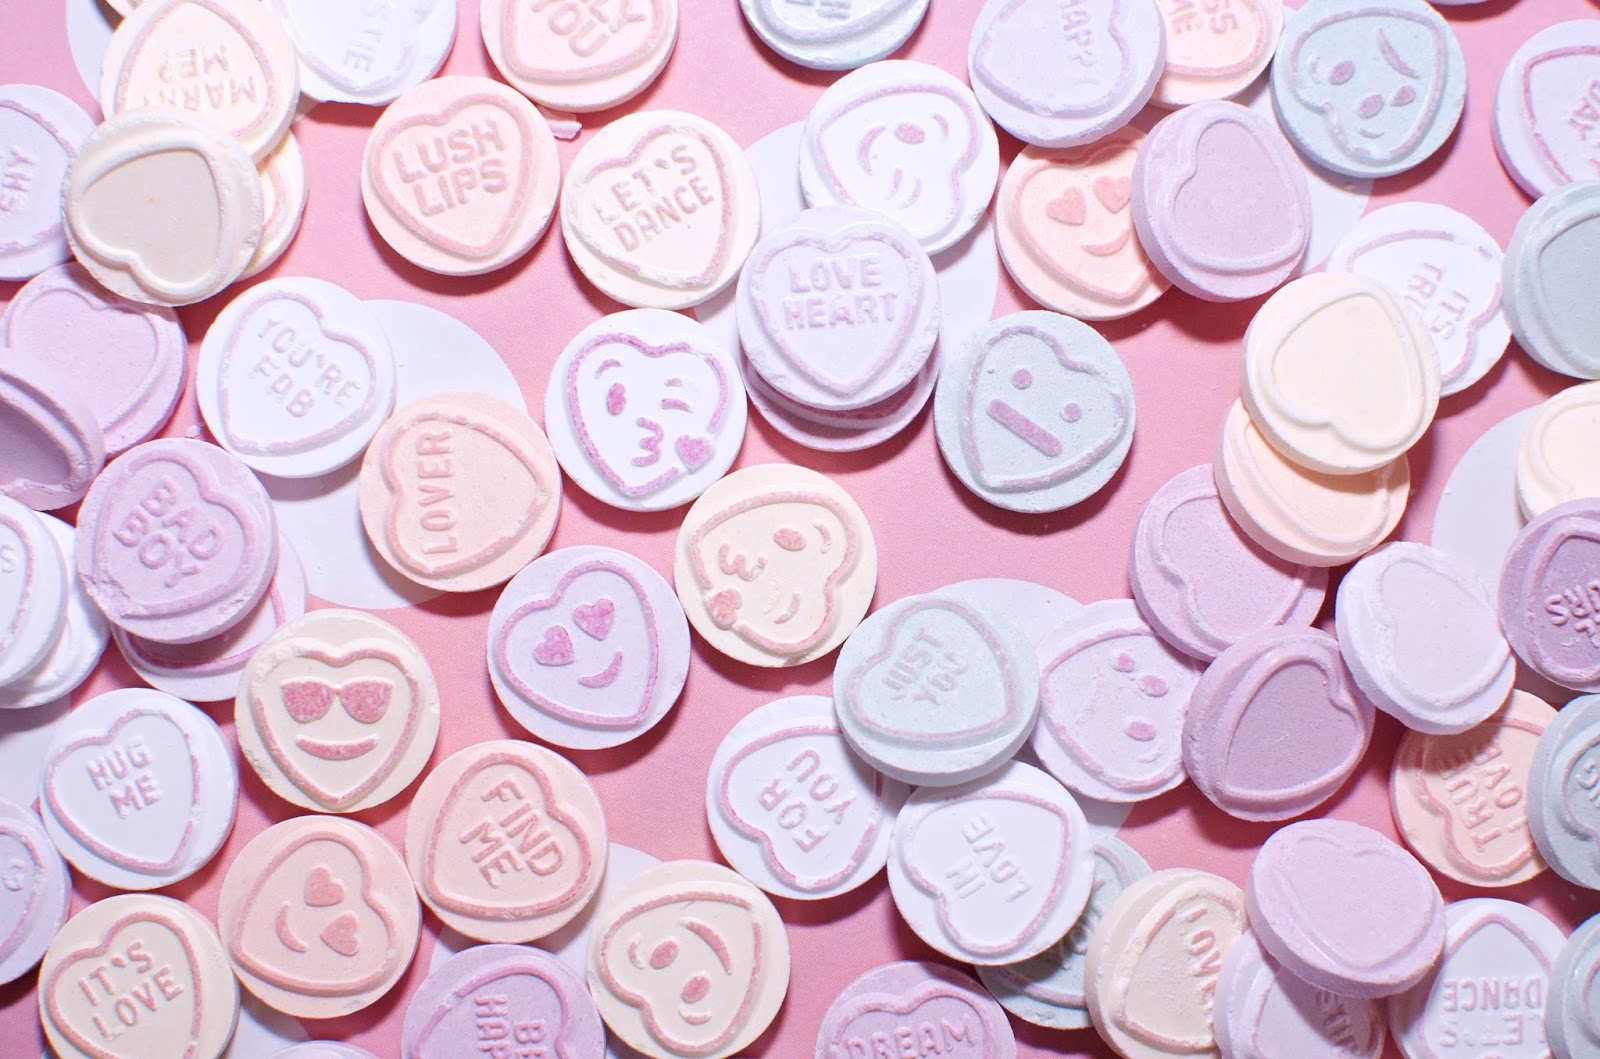 5 Alternative Ideas for Celebrating Valentine's Day